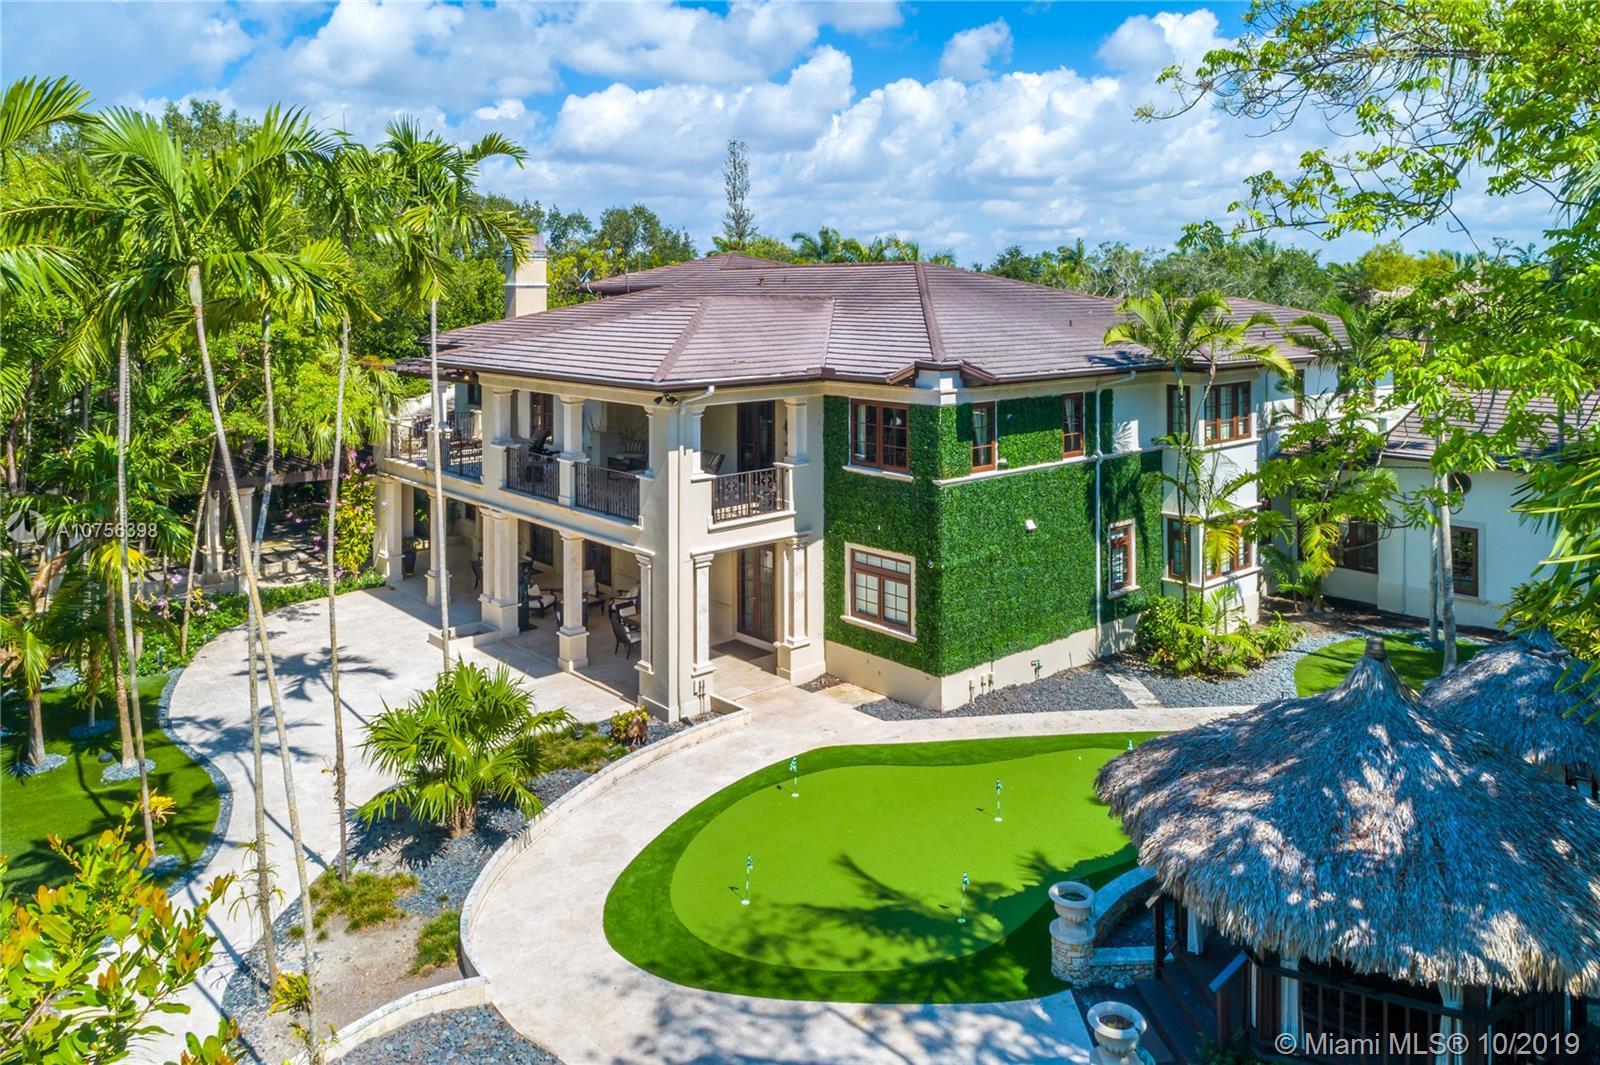 4800 Pine Dr, Miami, FL 33143